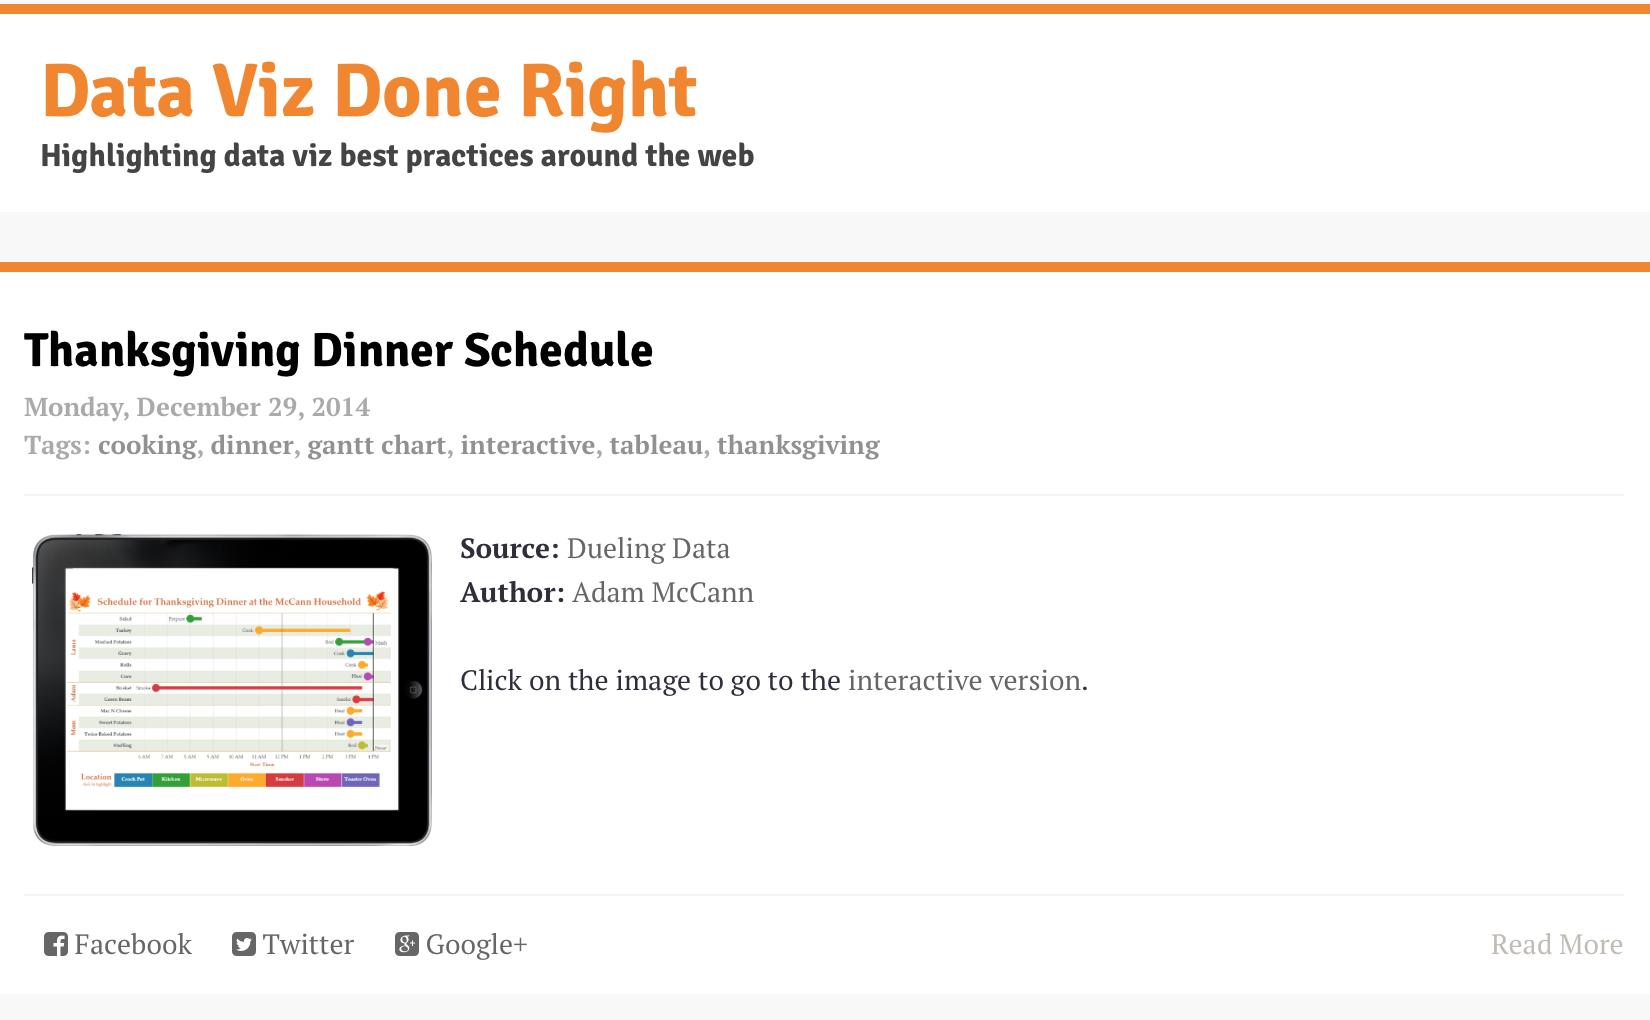 Link: Data Viz Done Right